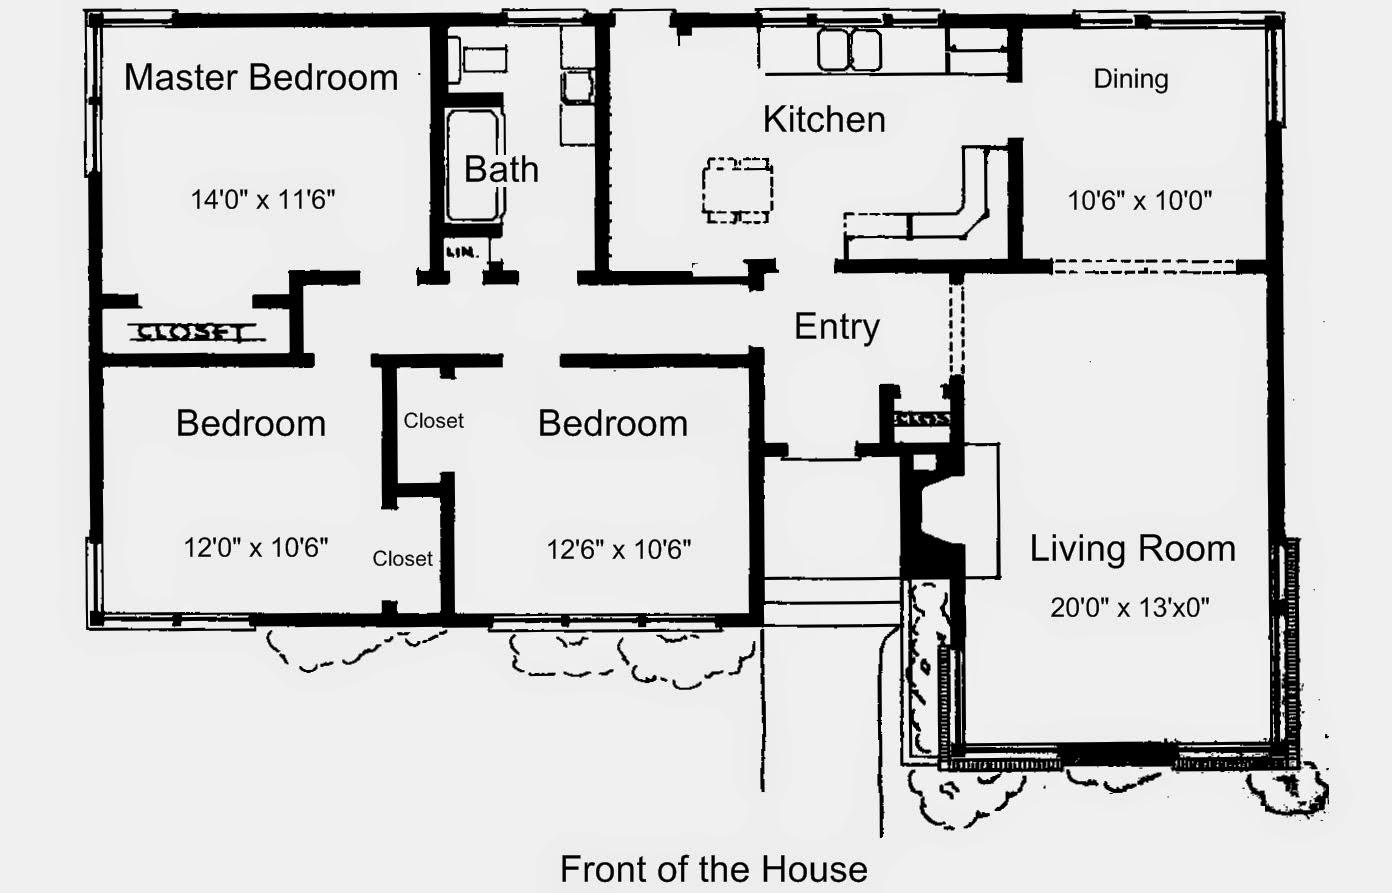 Rumah Minimalis Beserta Denahnya Terbaru Denah Rumah 4 Kamar